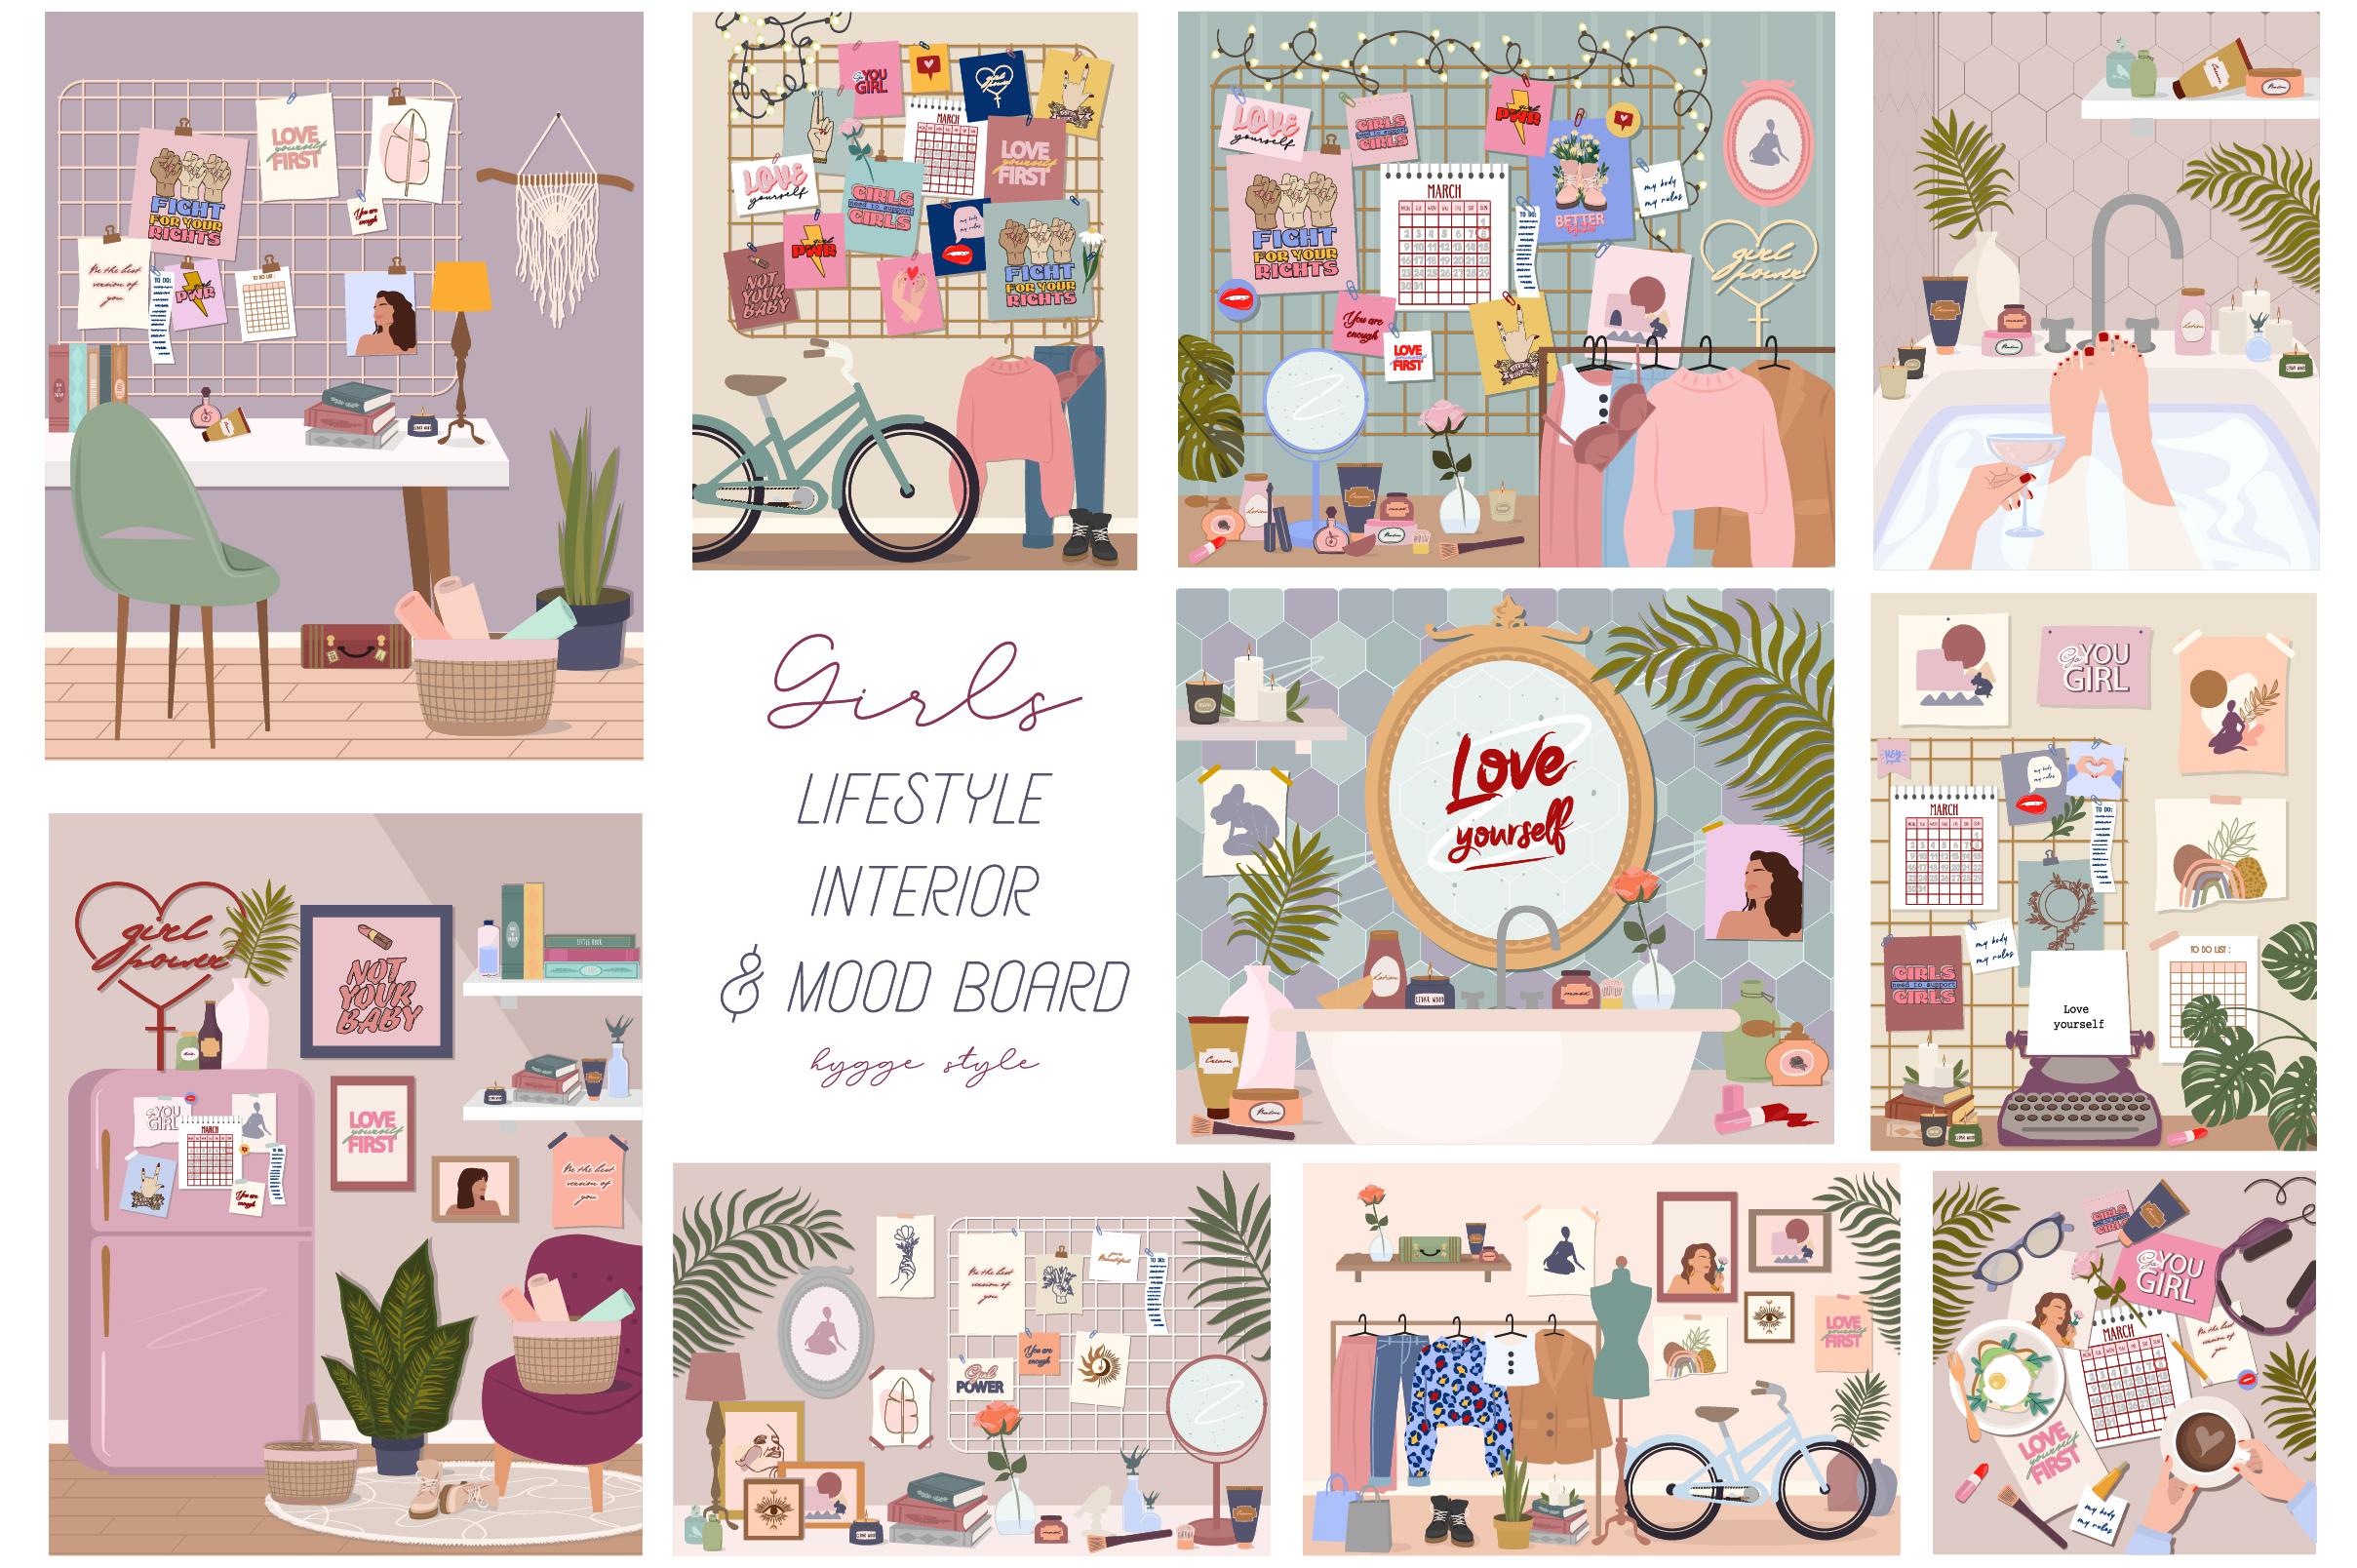 Lifestyle interior & mood board example image 10